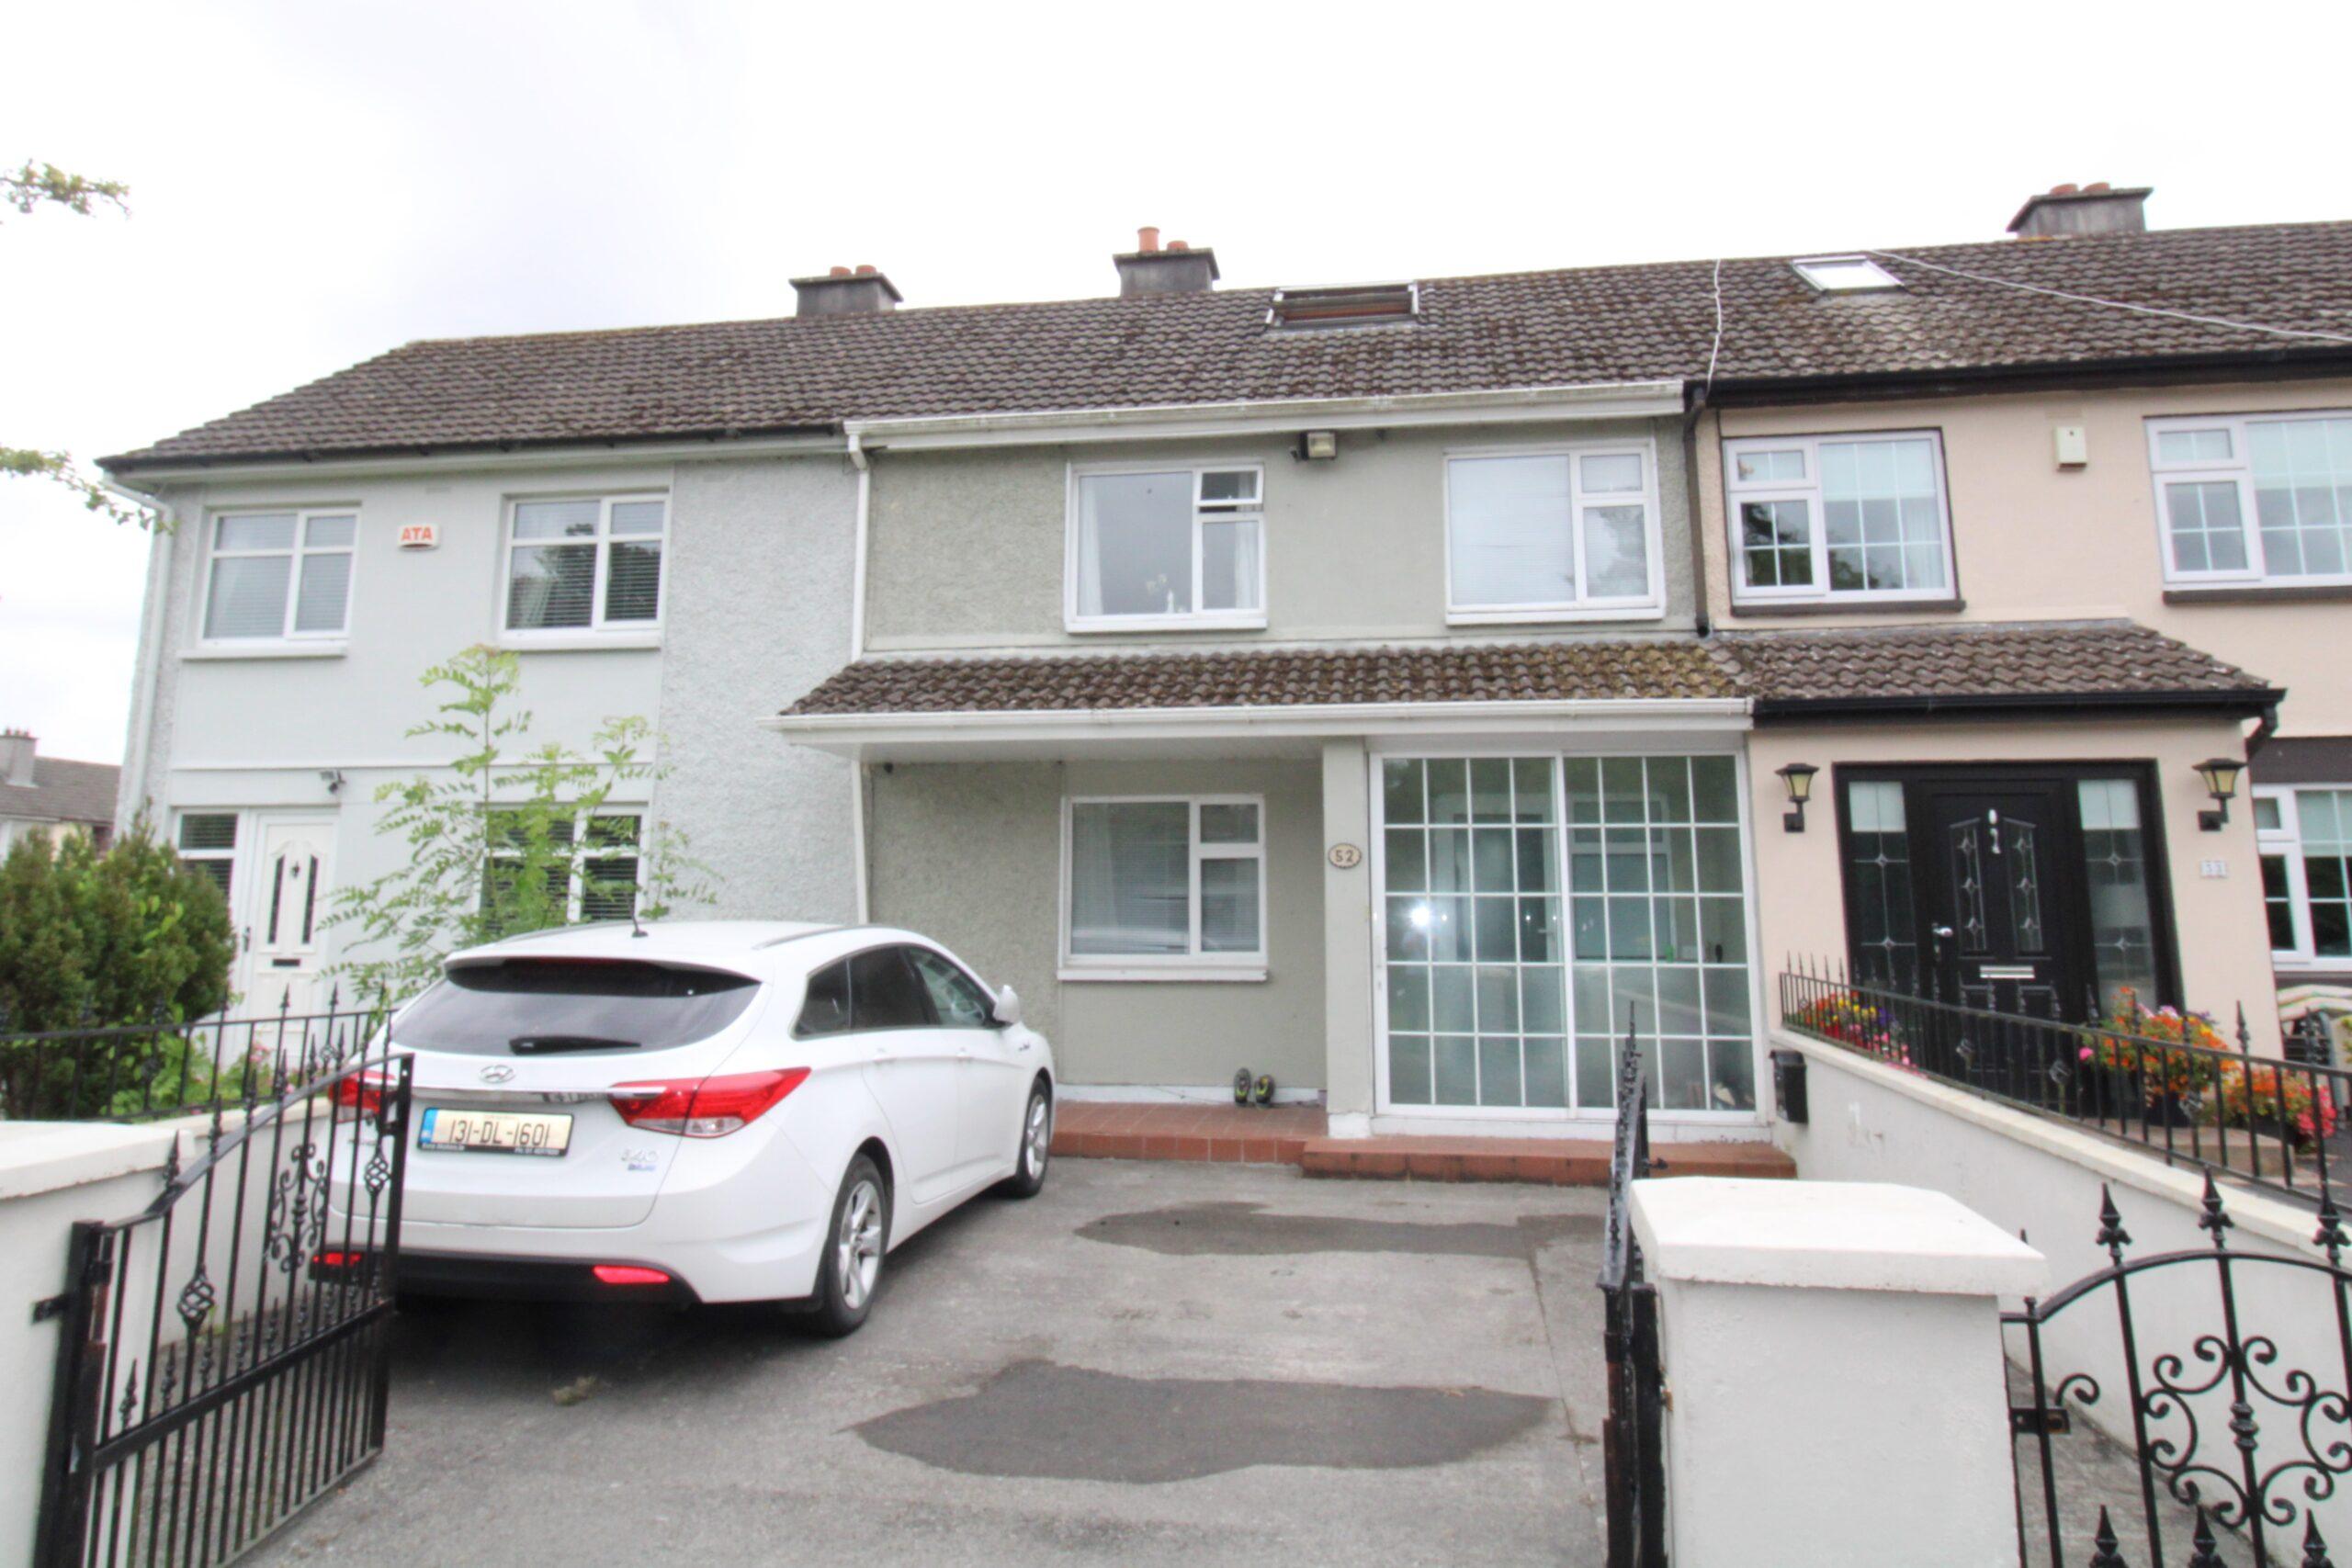 52 Castleview, Dunboyne, Co Meath